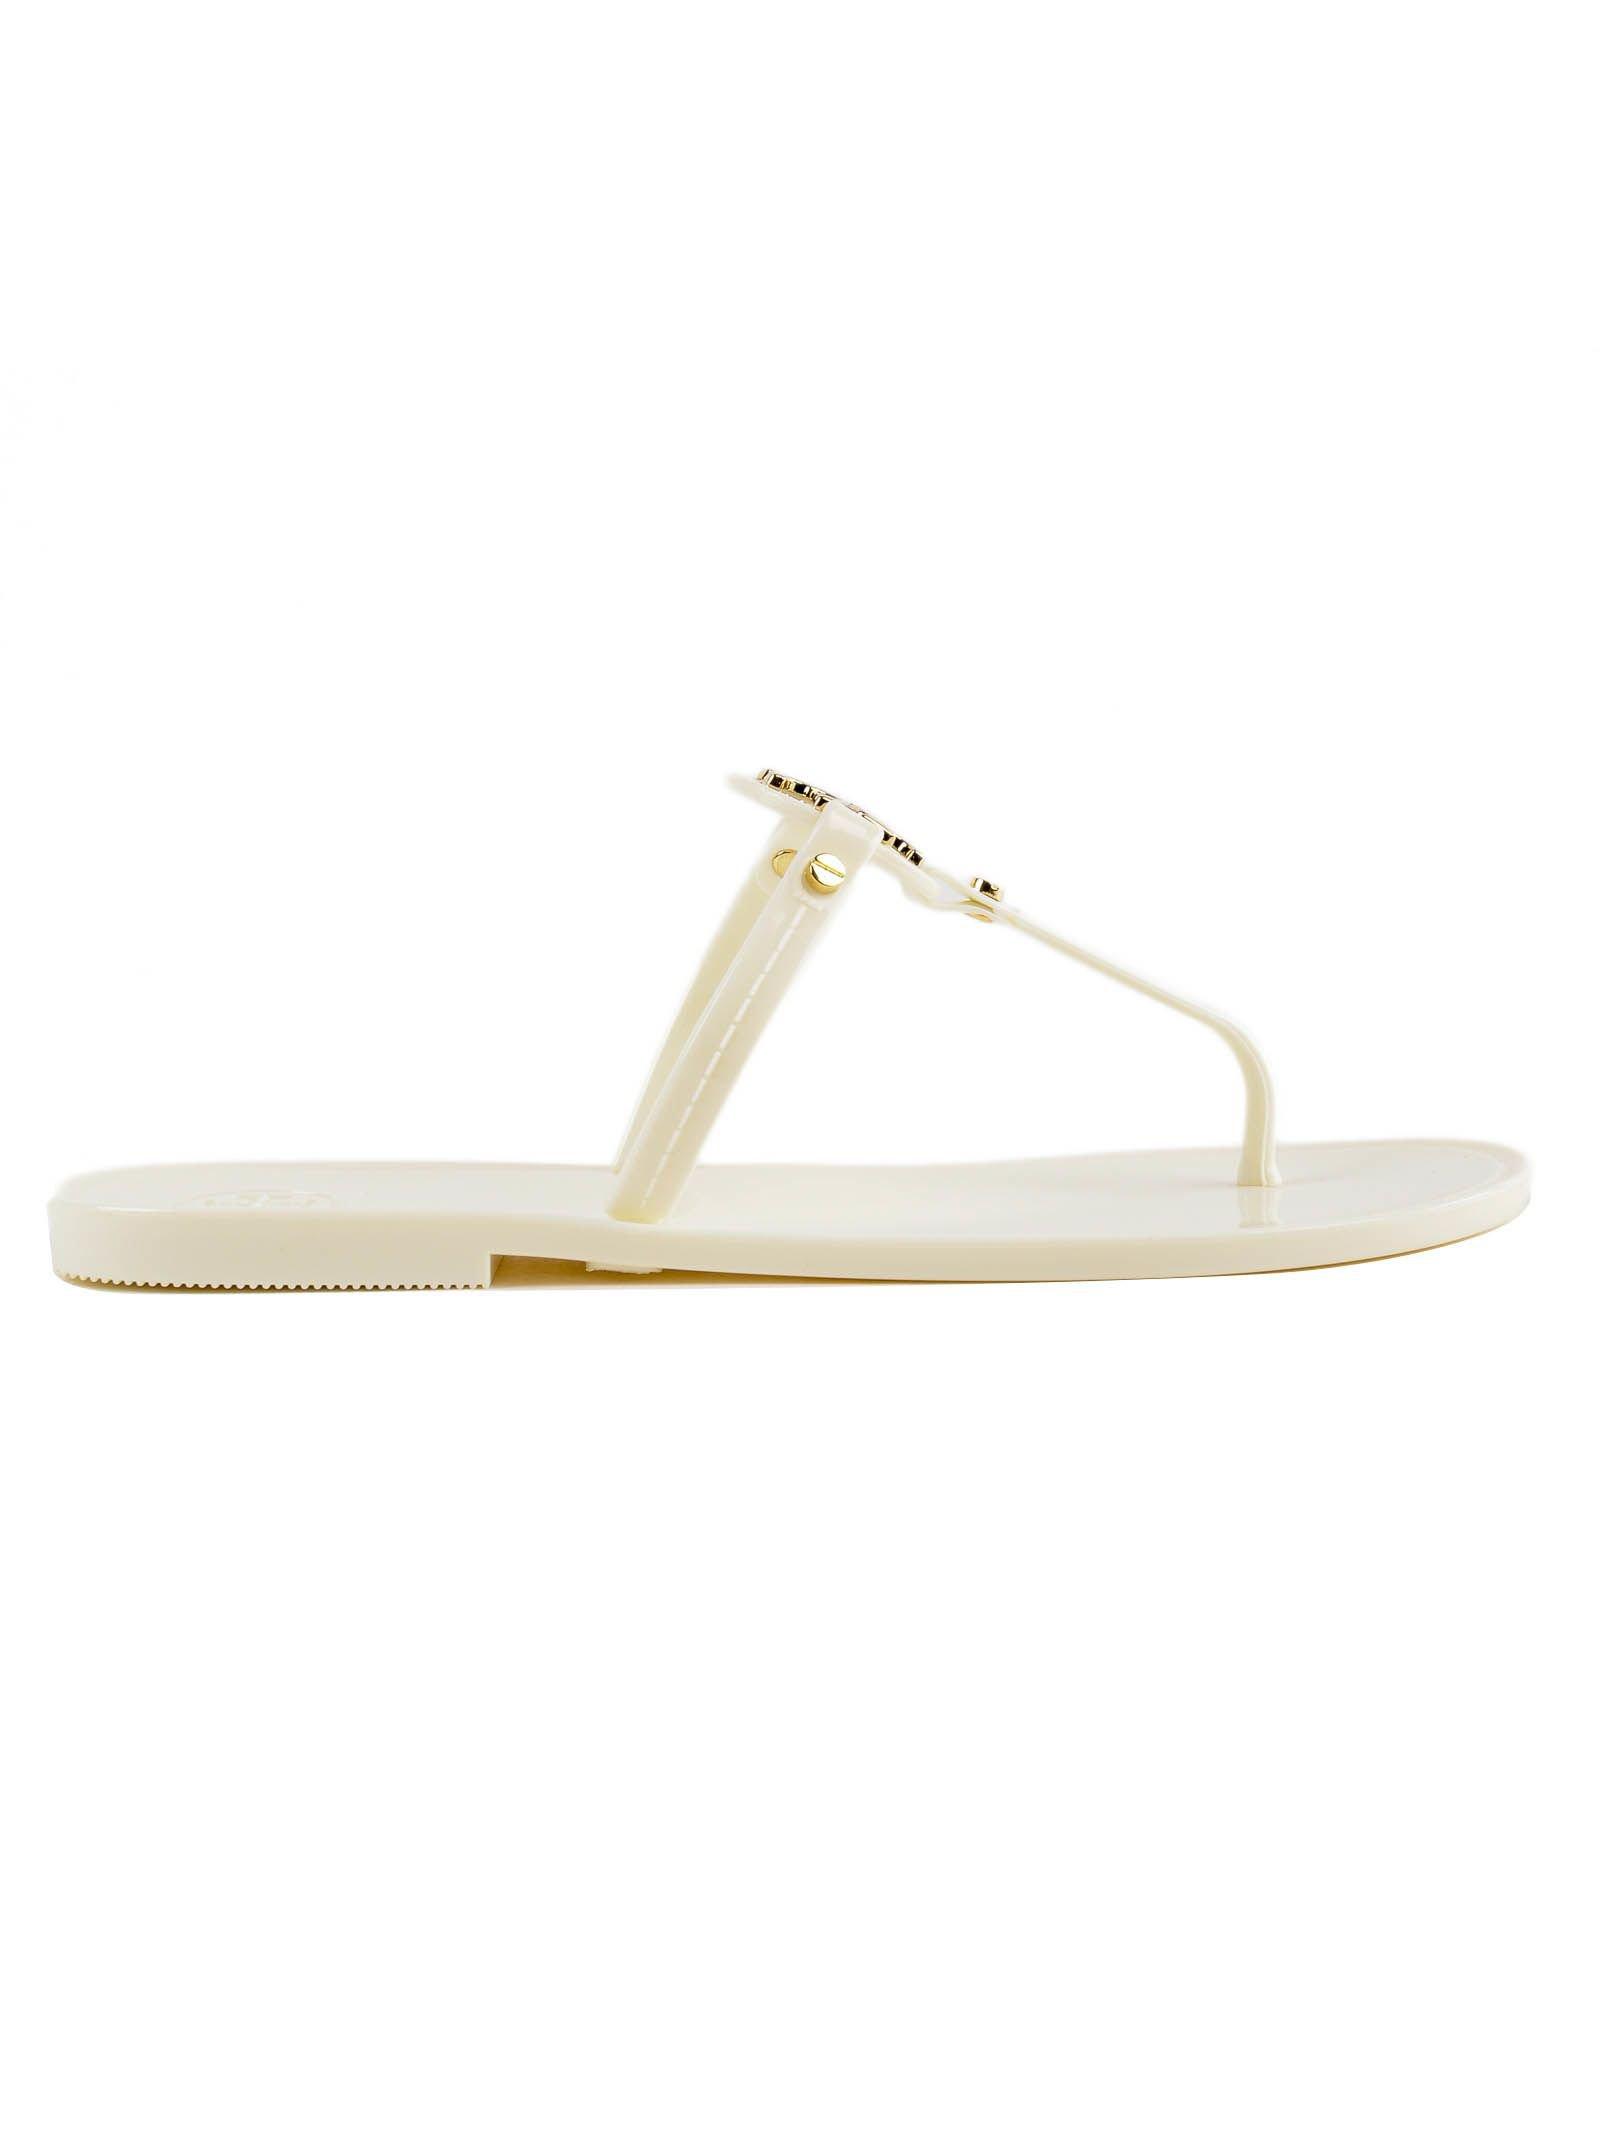 Tory Burch T-bar Flat Sandals